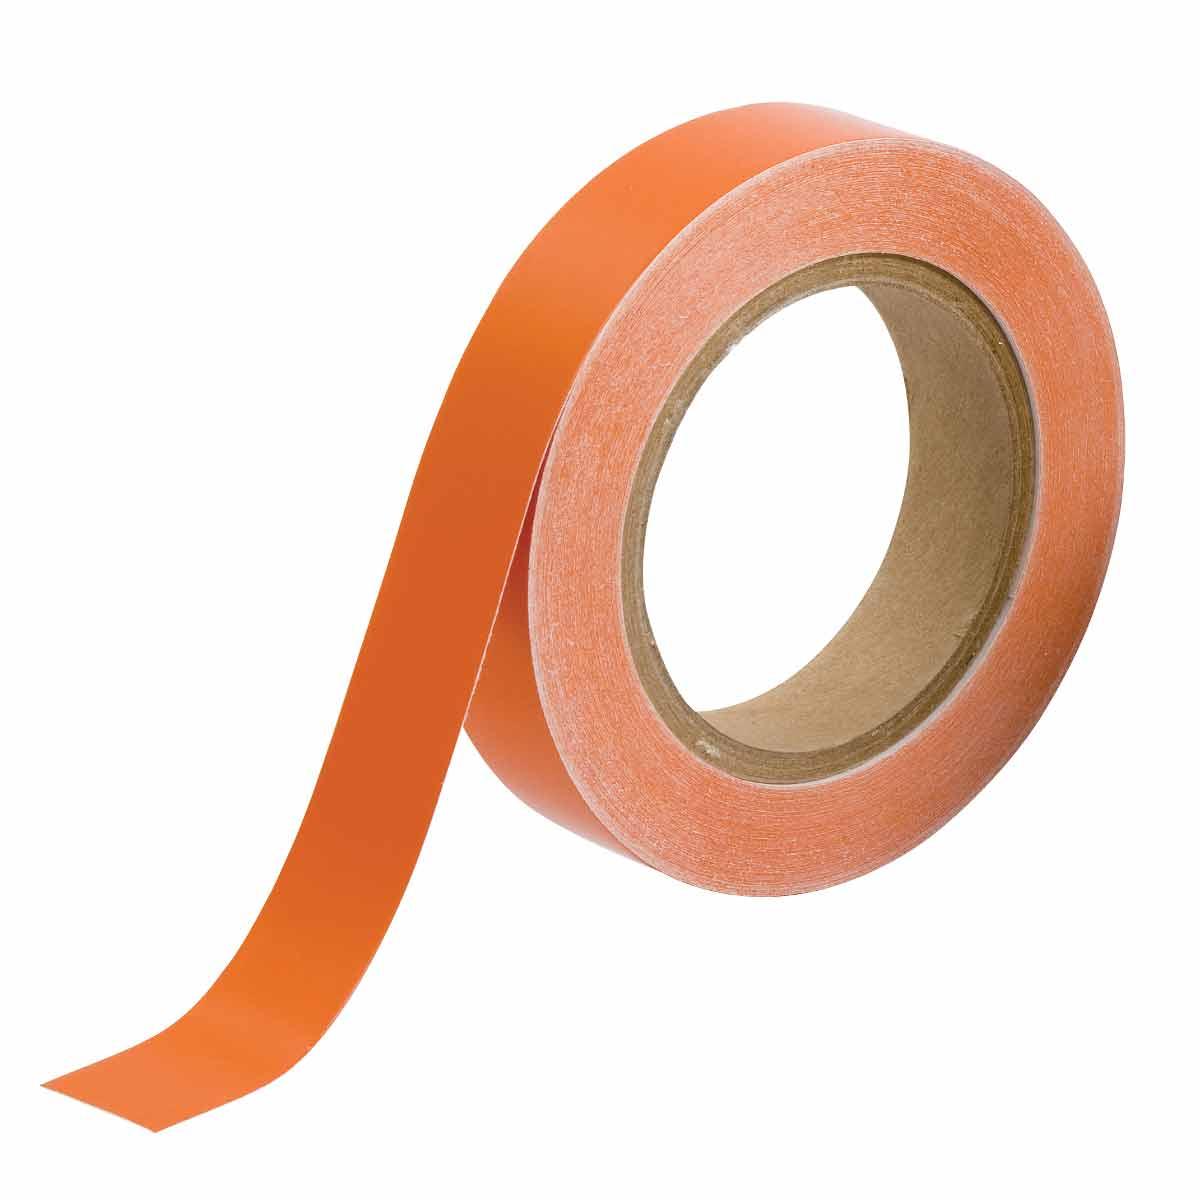 BRADY 91428 Pipe Banding Tape